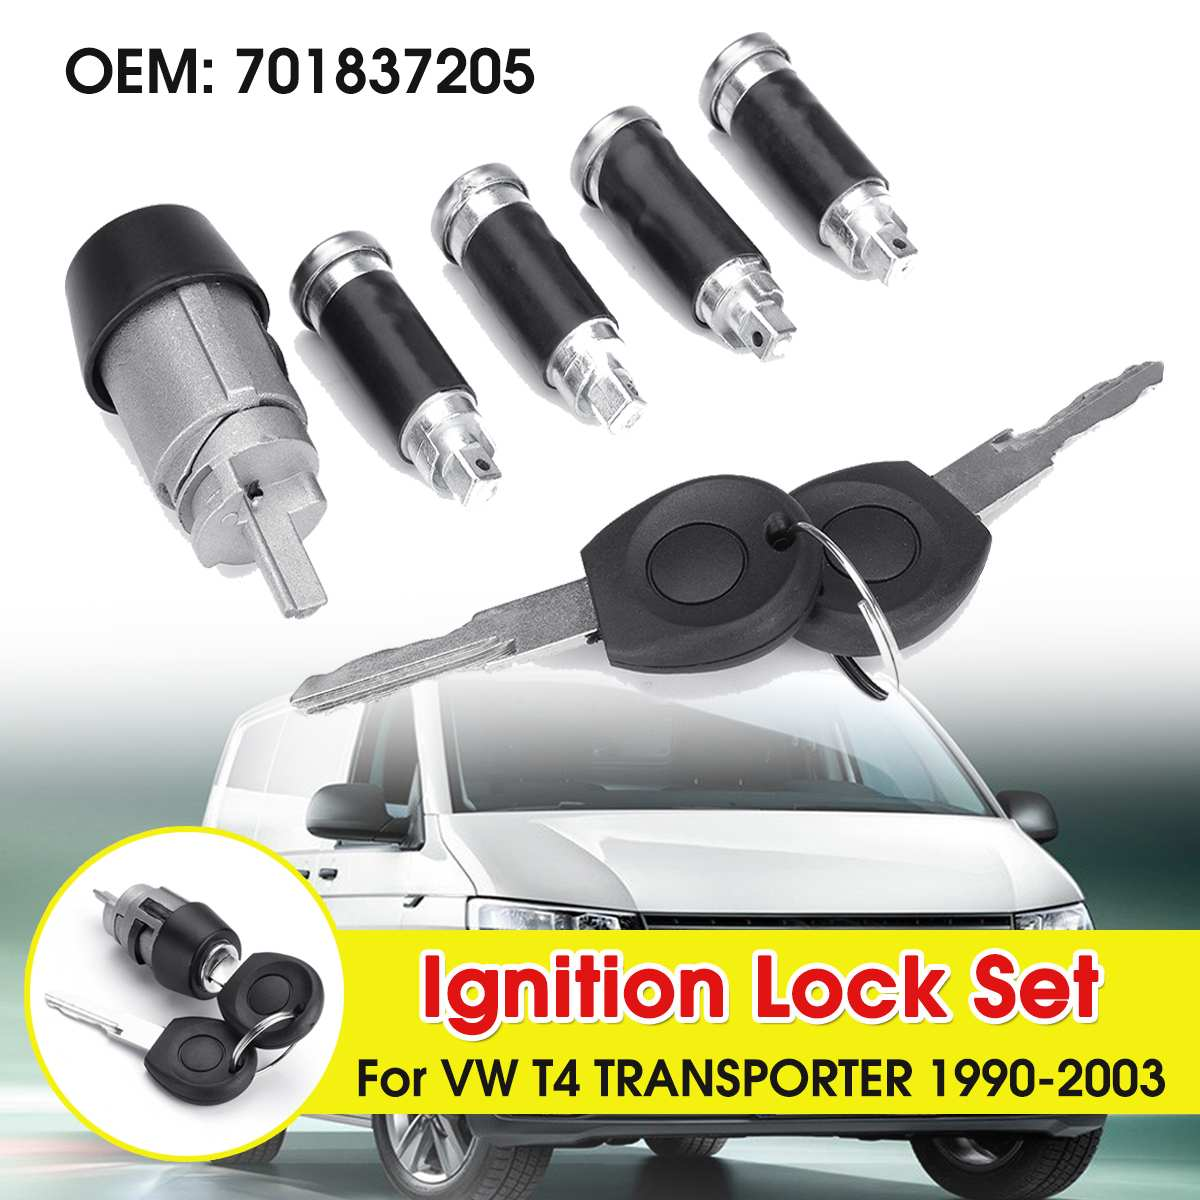 2 Keys Ignition Switch Door Lock Barrel Set For VW T4 Caravelle 1990-2003 Transporter Double Barn Doors